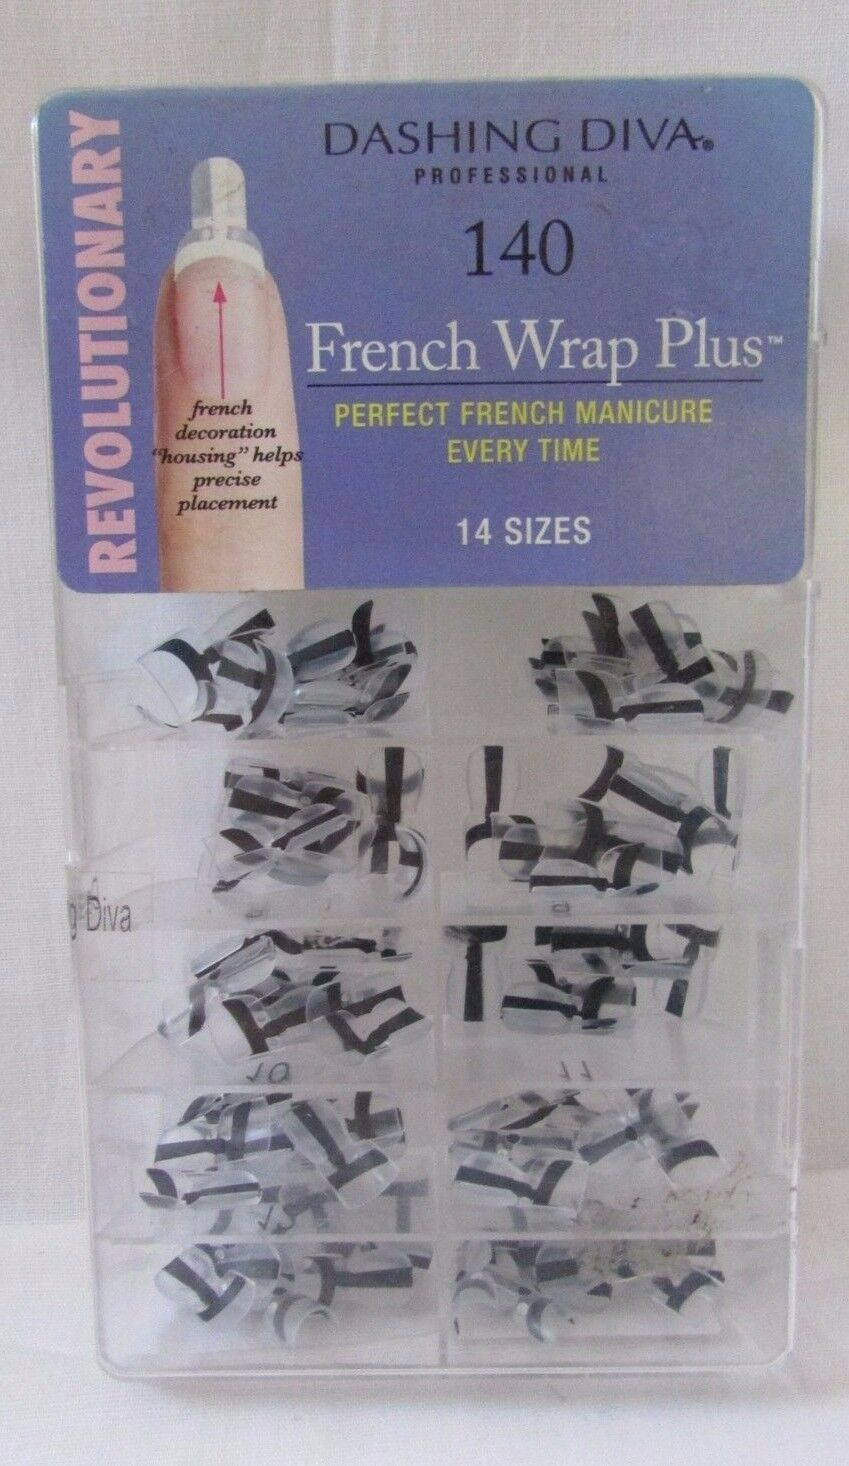 Dashing Diva French Wrap Plus Thin Black 140 Count | eBay